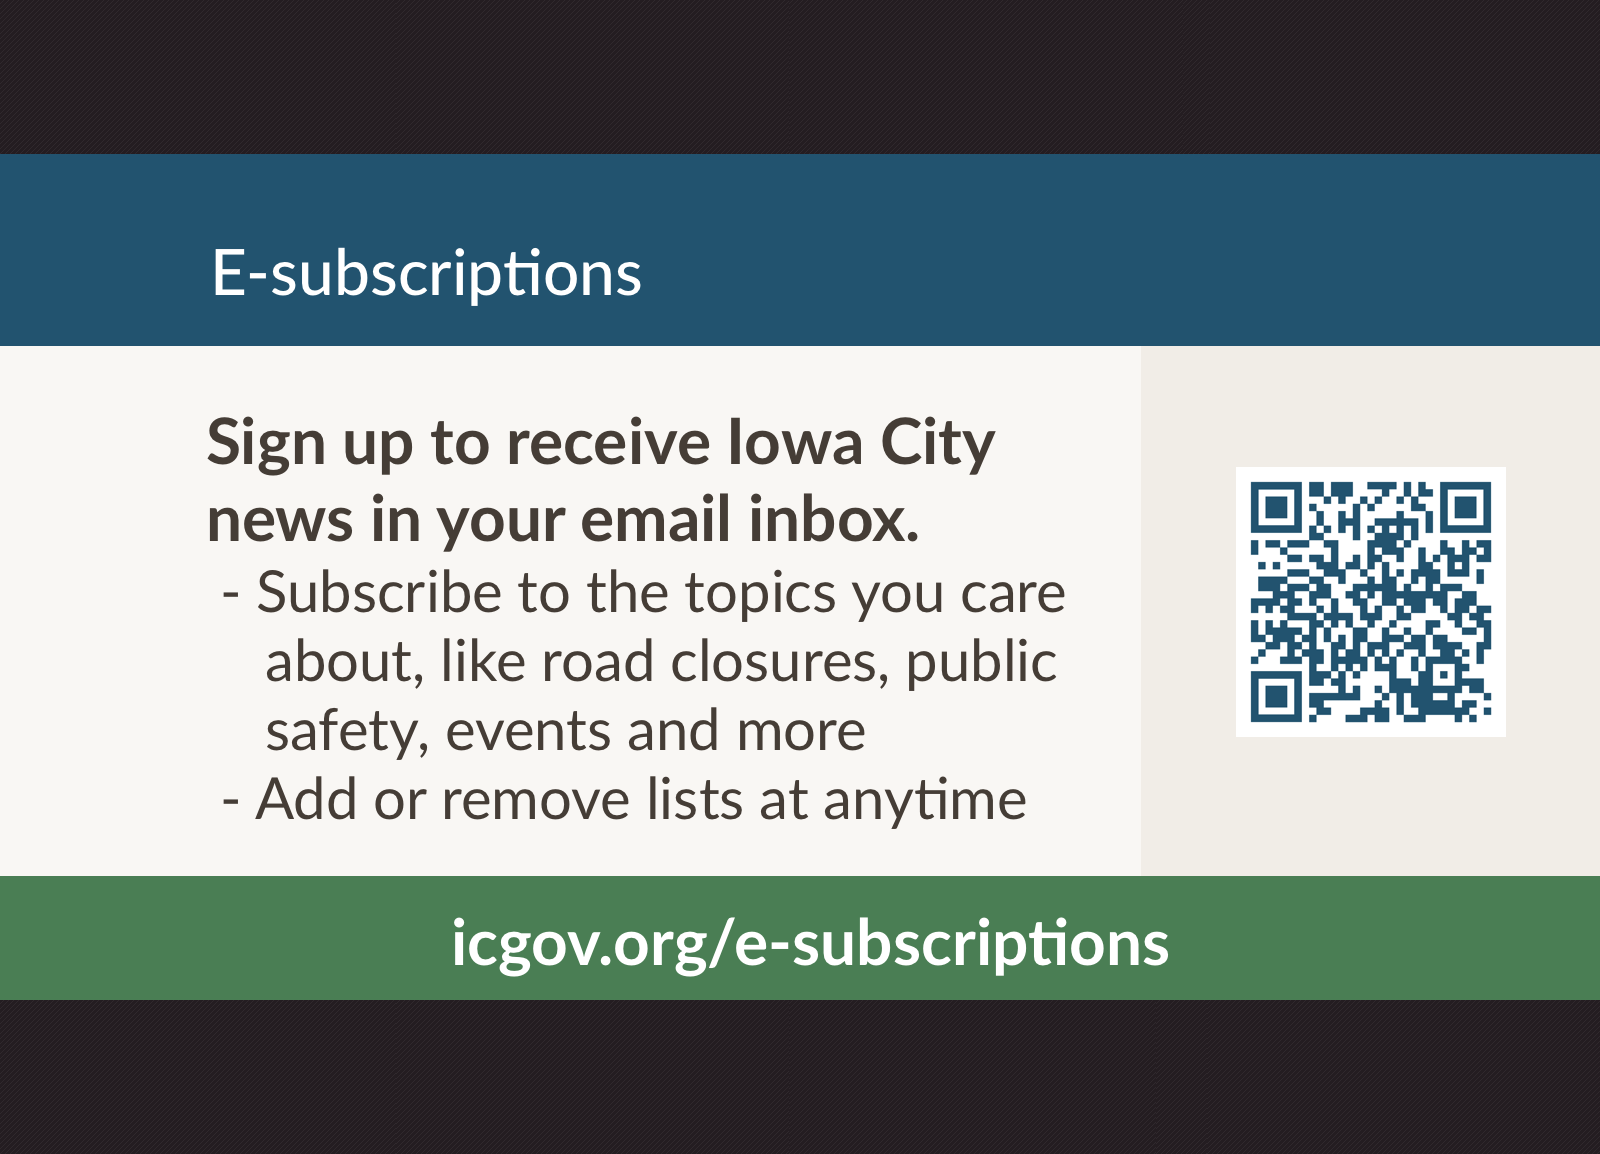 e-subscriptions